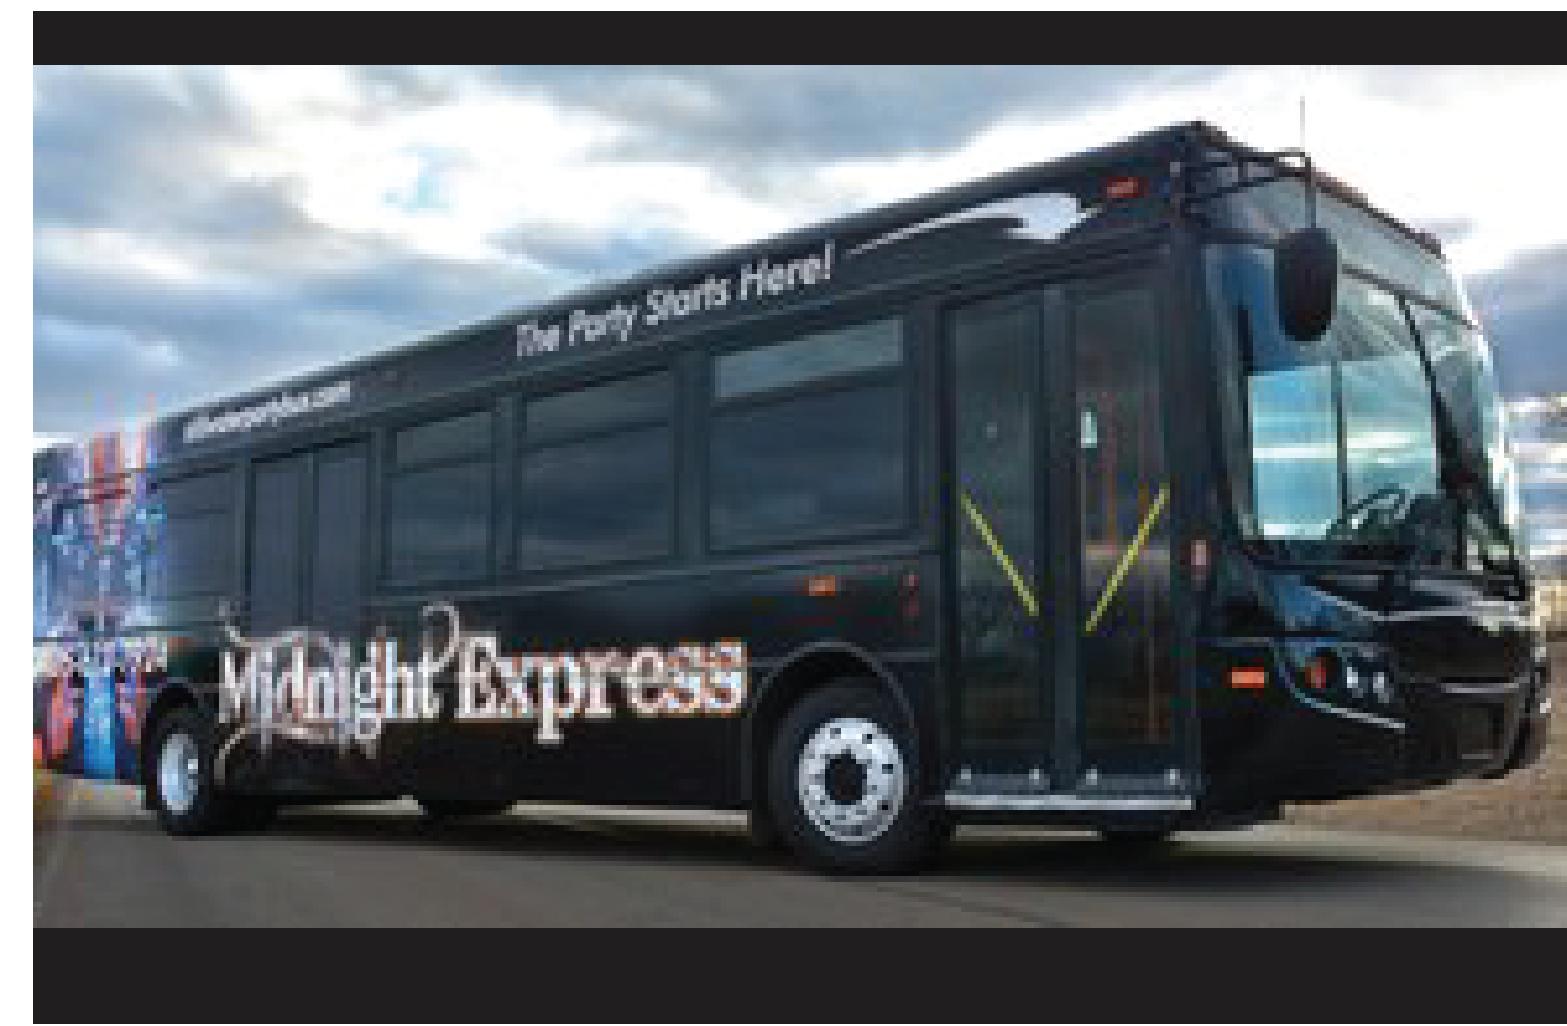 Midnight Express Transit | Visit Stillwater